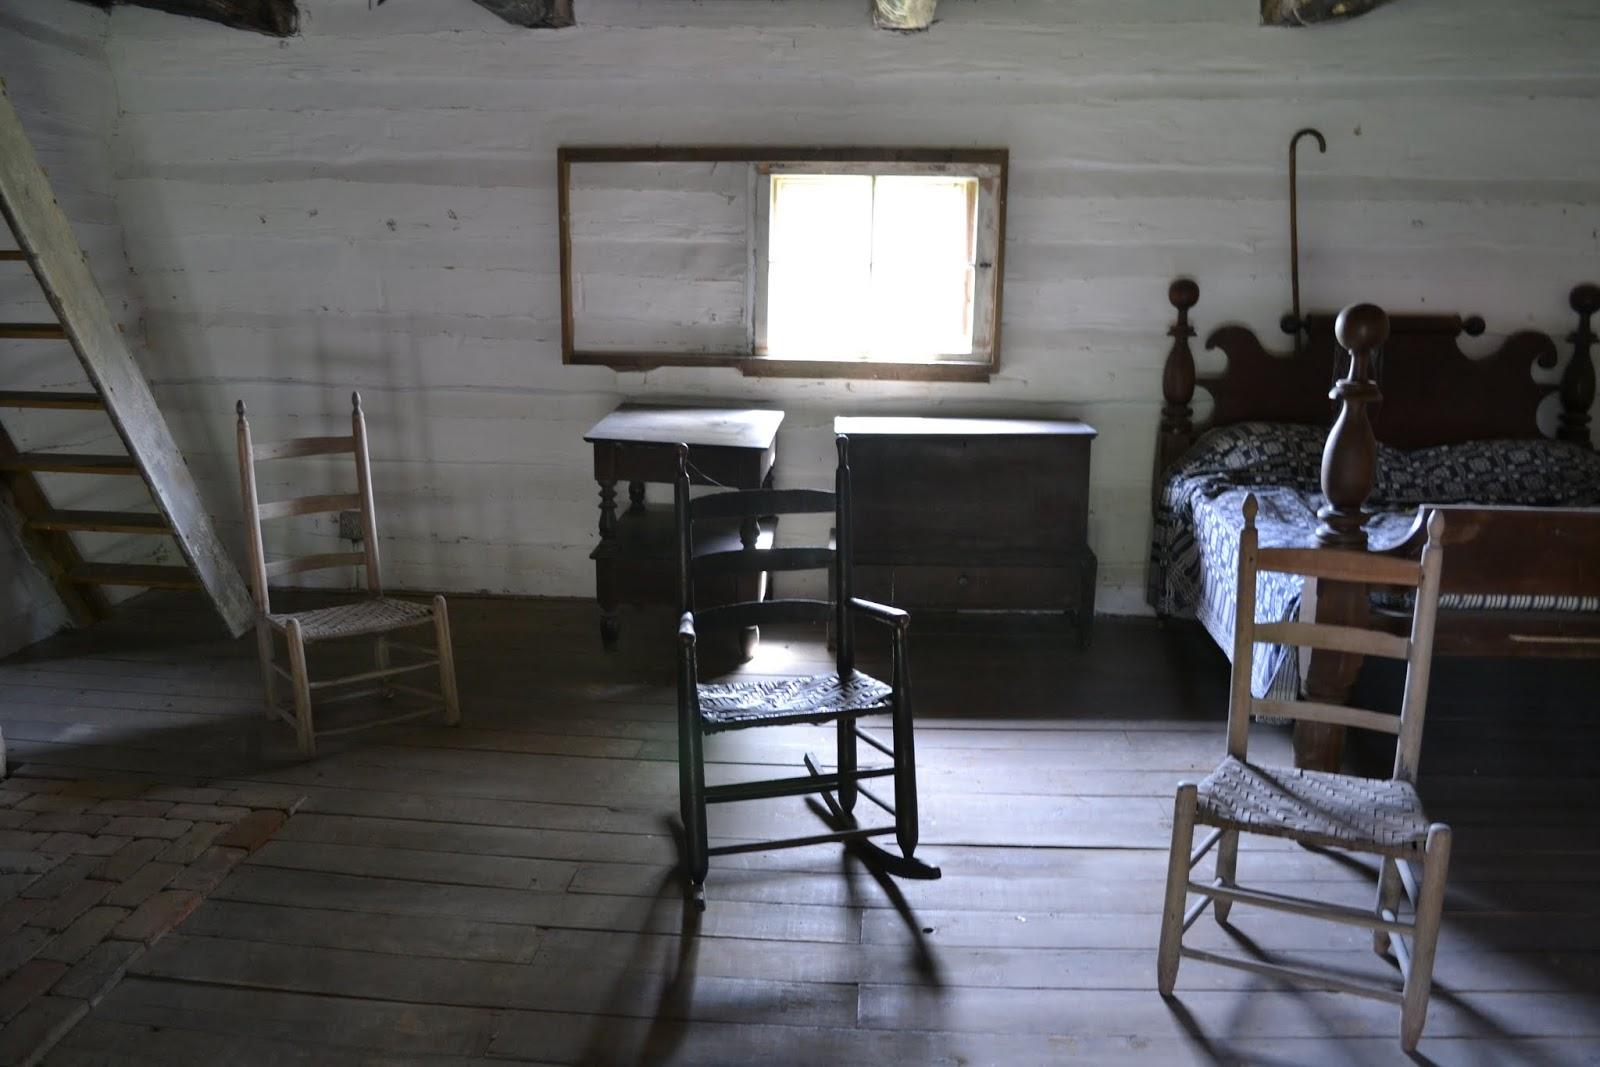 Эрмитаж - поместье президента Эндрю Джексона, Эрмитаж, Теннесси (Andrew Jackson's Hermitage, Hermitage, TN)